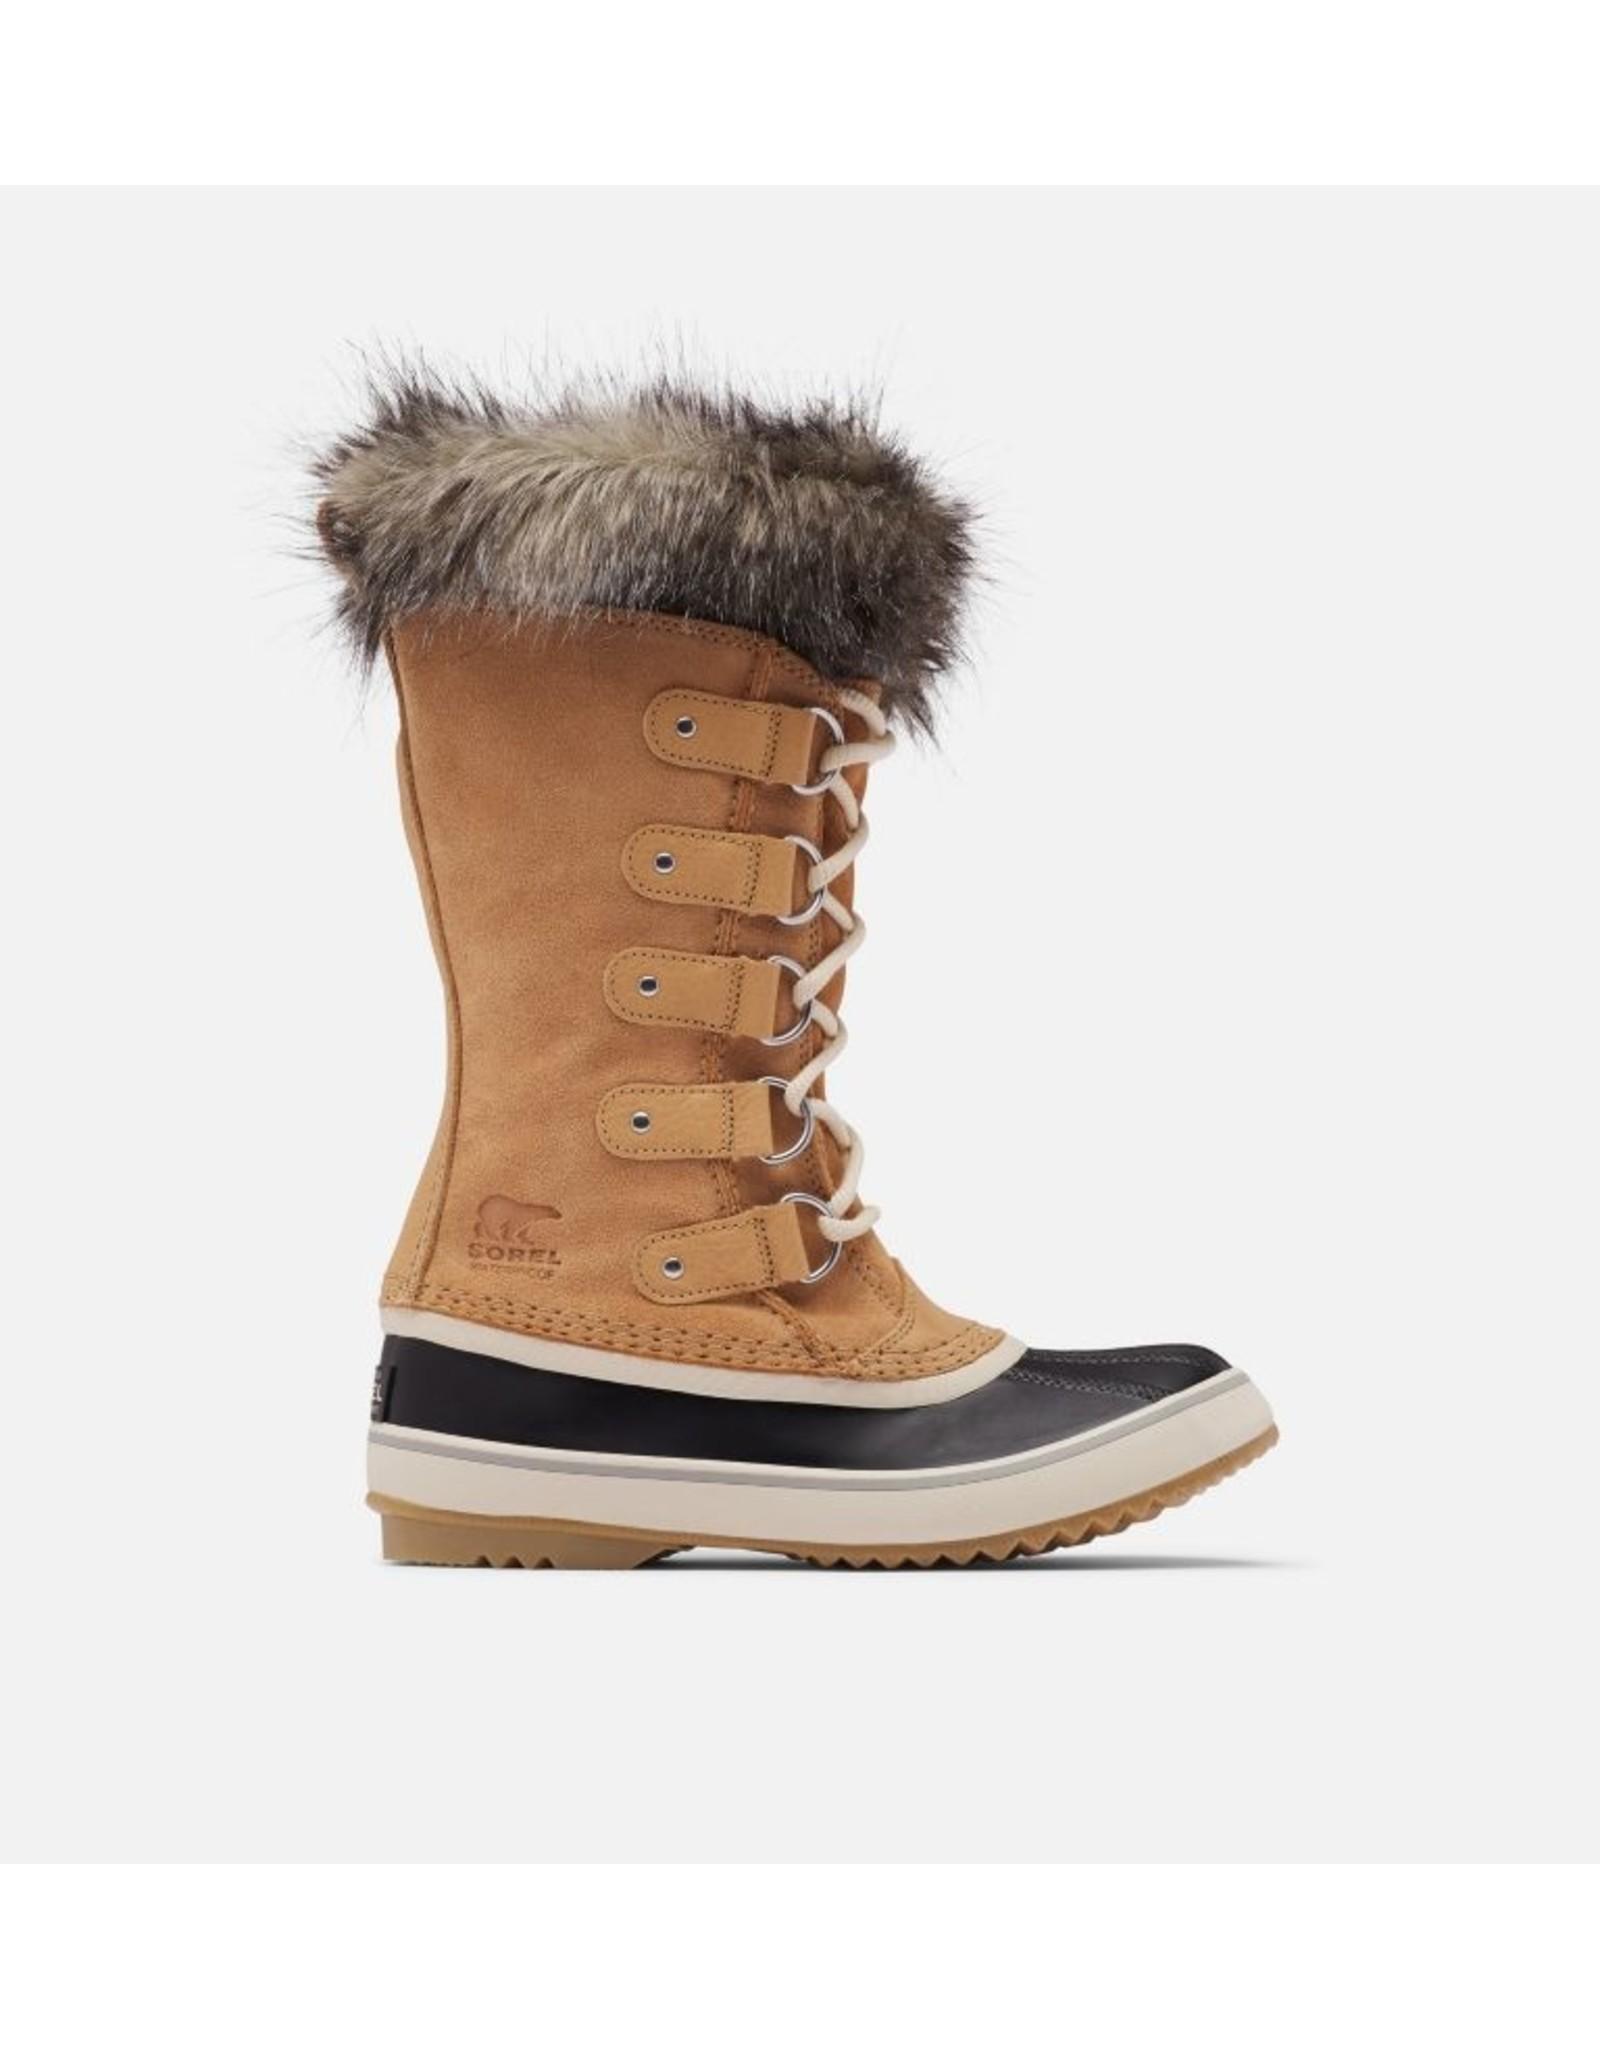 Sorel Sorel - Women's Joan of Arctic Boot